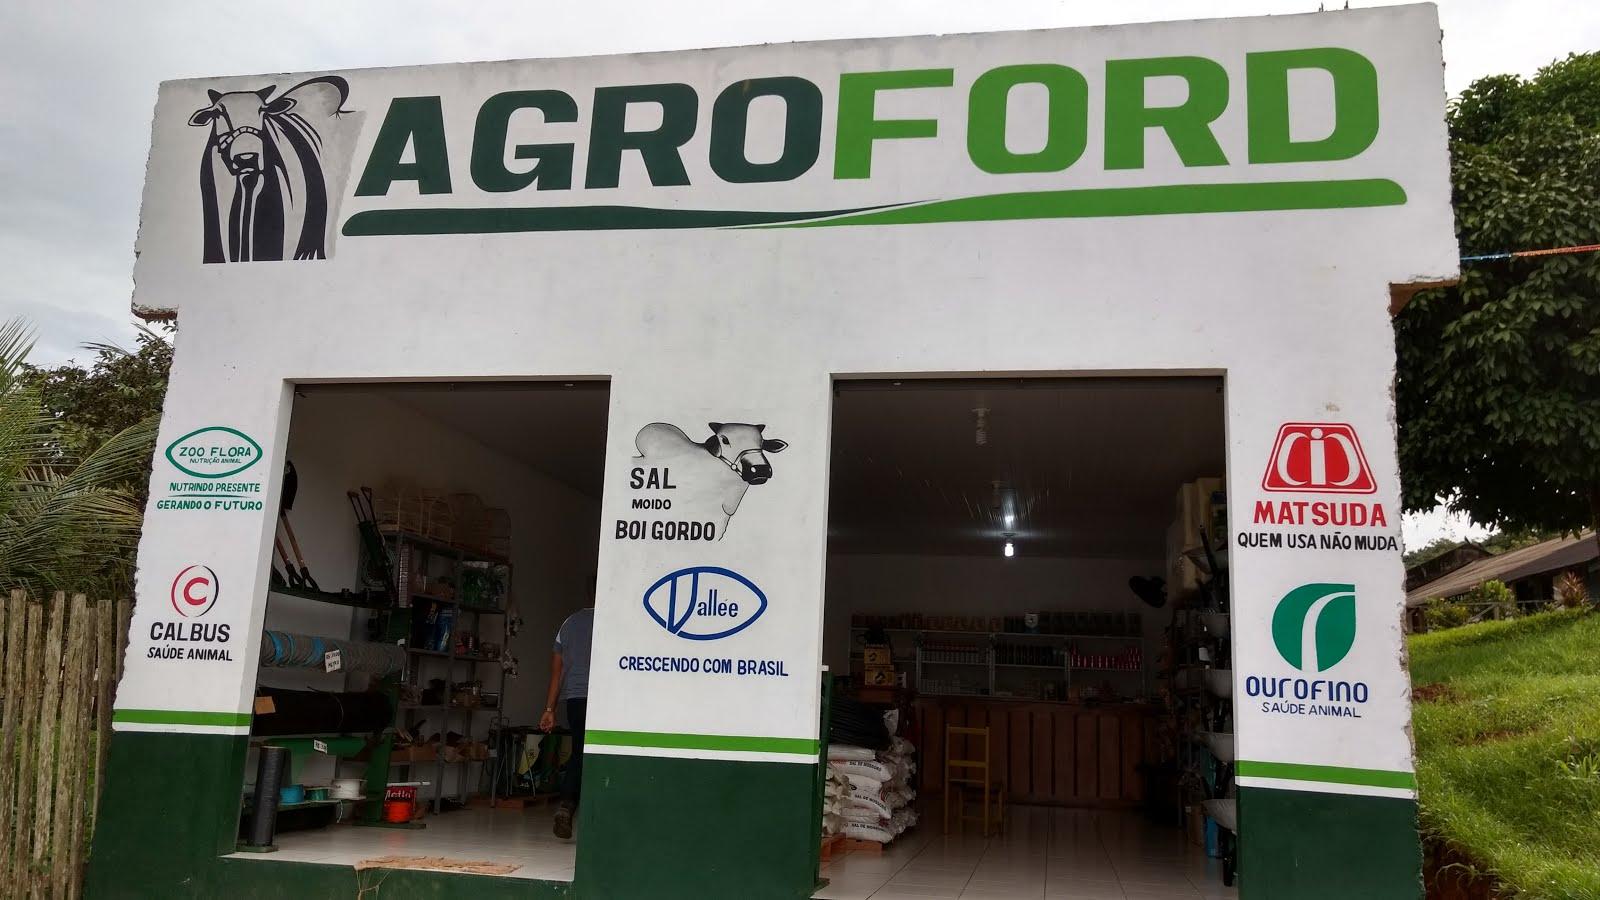 AGROFORD